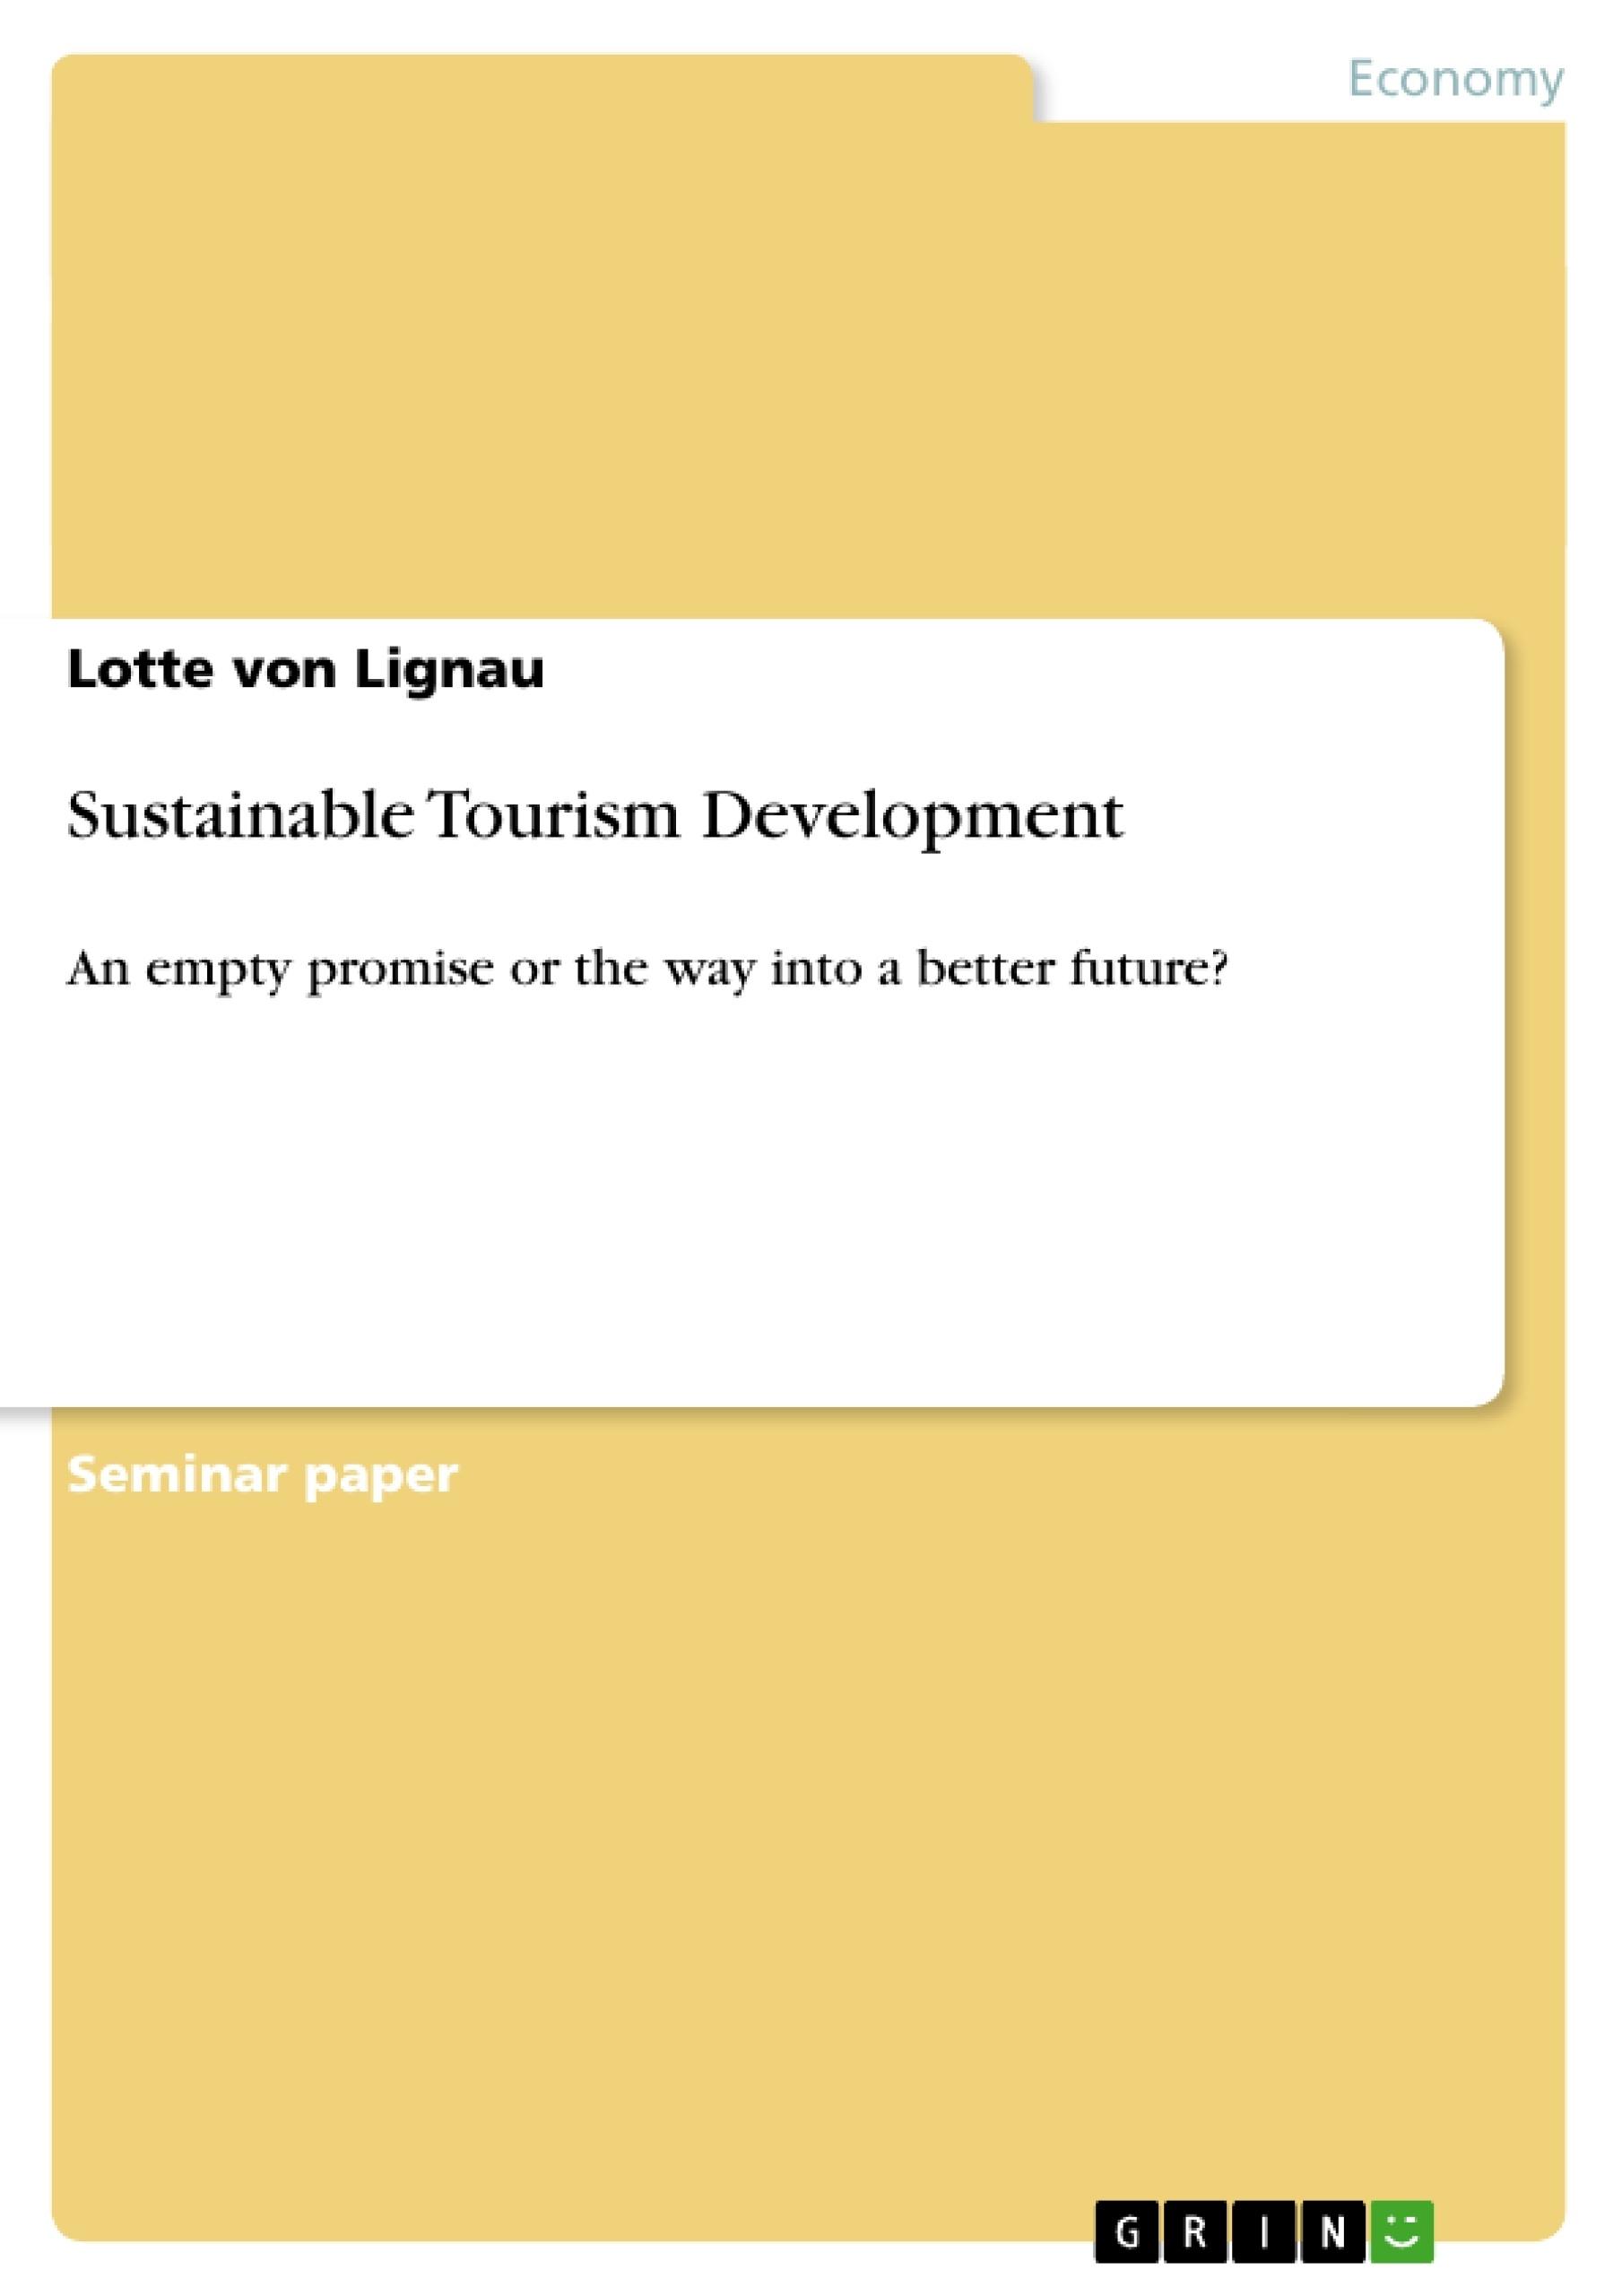 Title: Sustainable Tourism Development